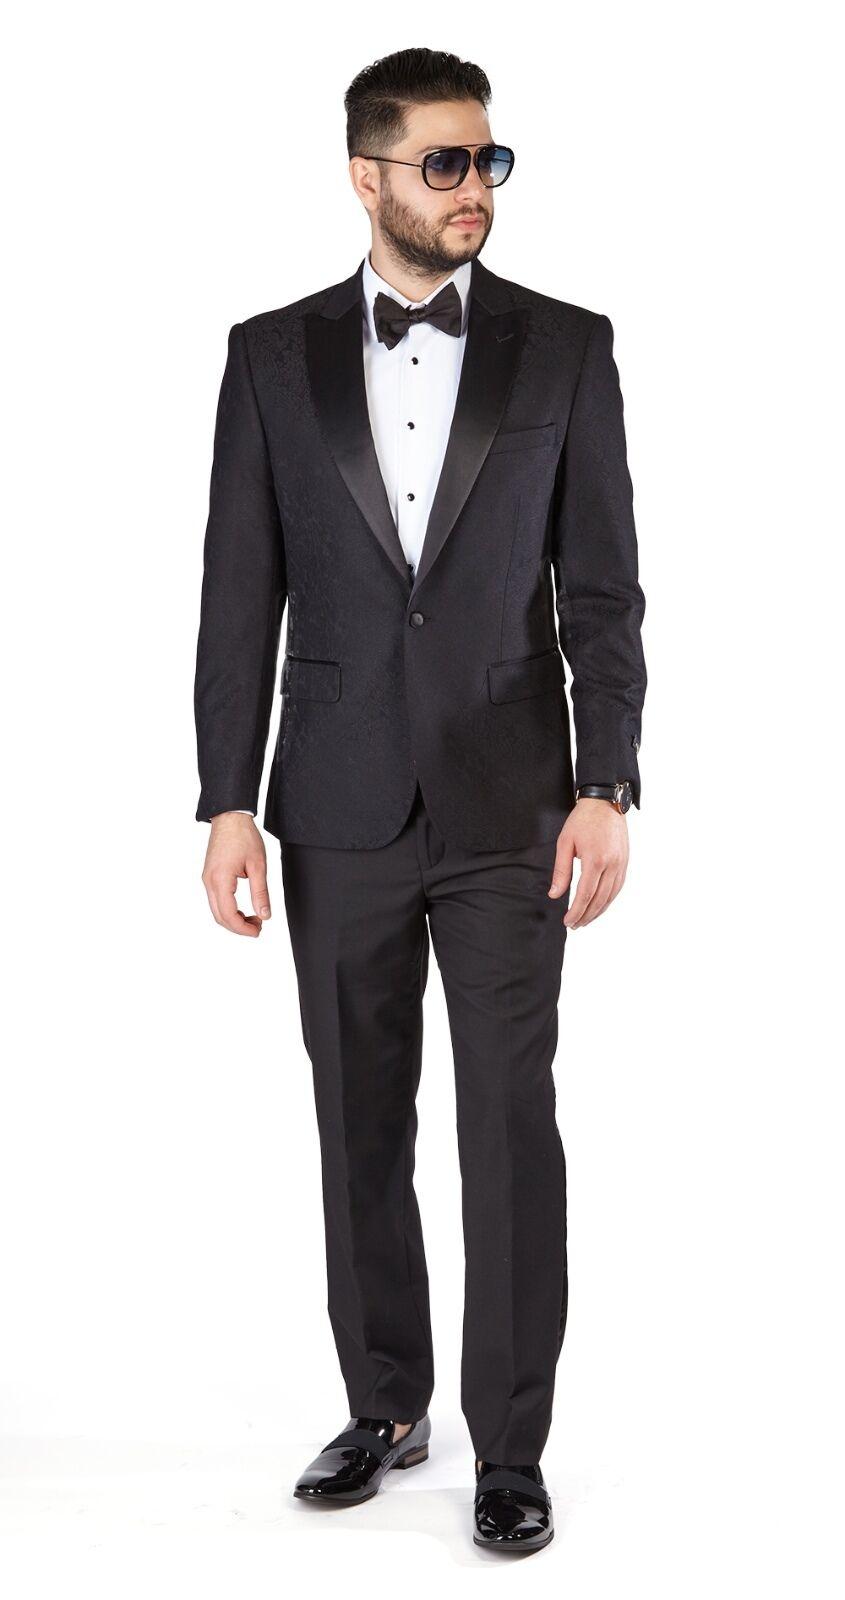 Slim Fit 1 Button Tuxedo Black Paisley Peak Lapel Jacket Black Pants 1778 AZAR